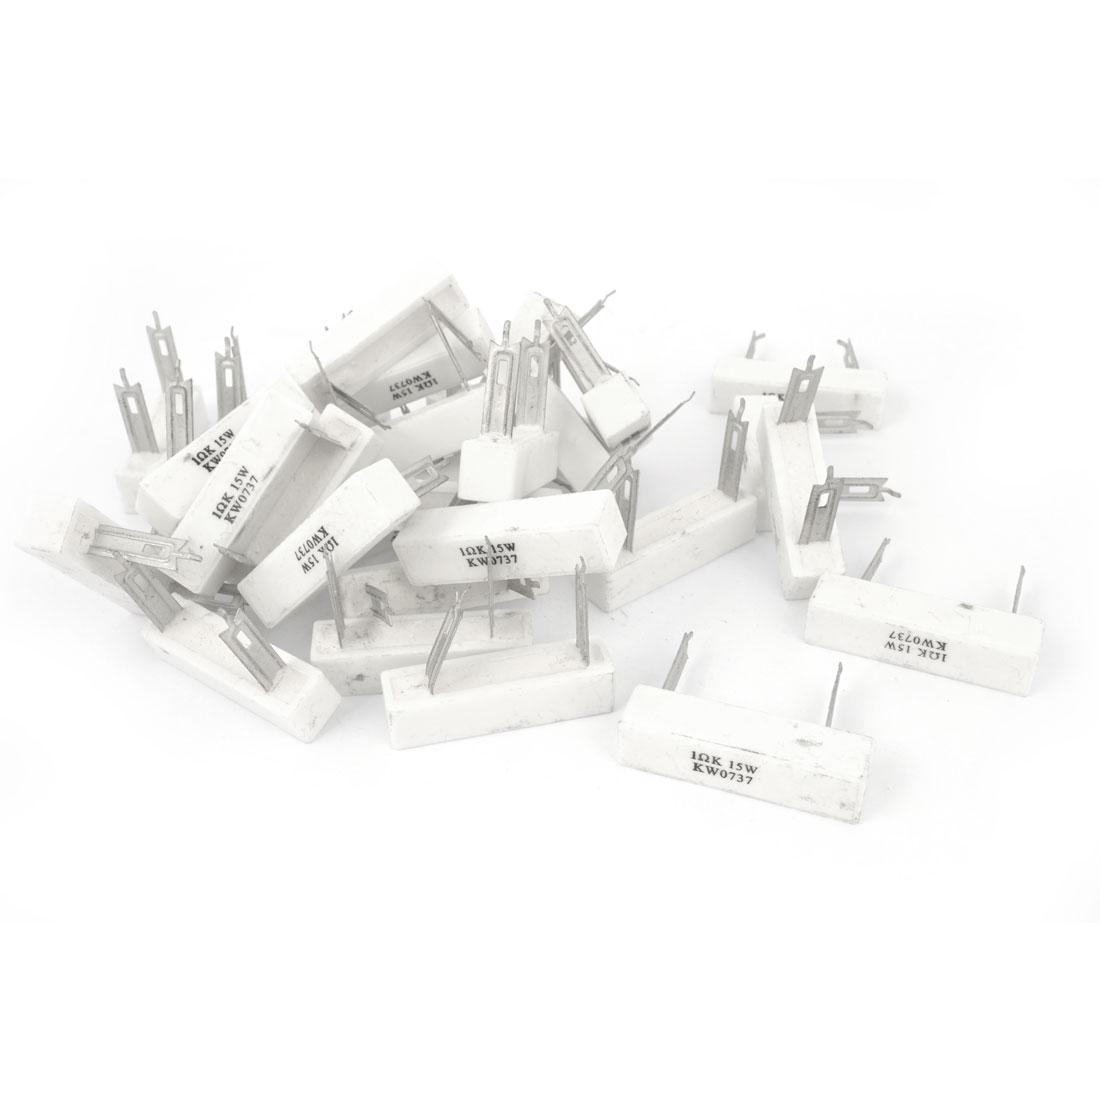 30 Pcs 15W 1 Ohm 2 Pin DIP Mount Vertical Ceramic Cement Power Resistor